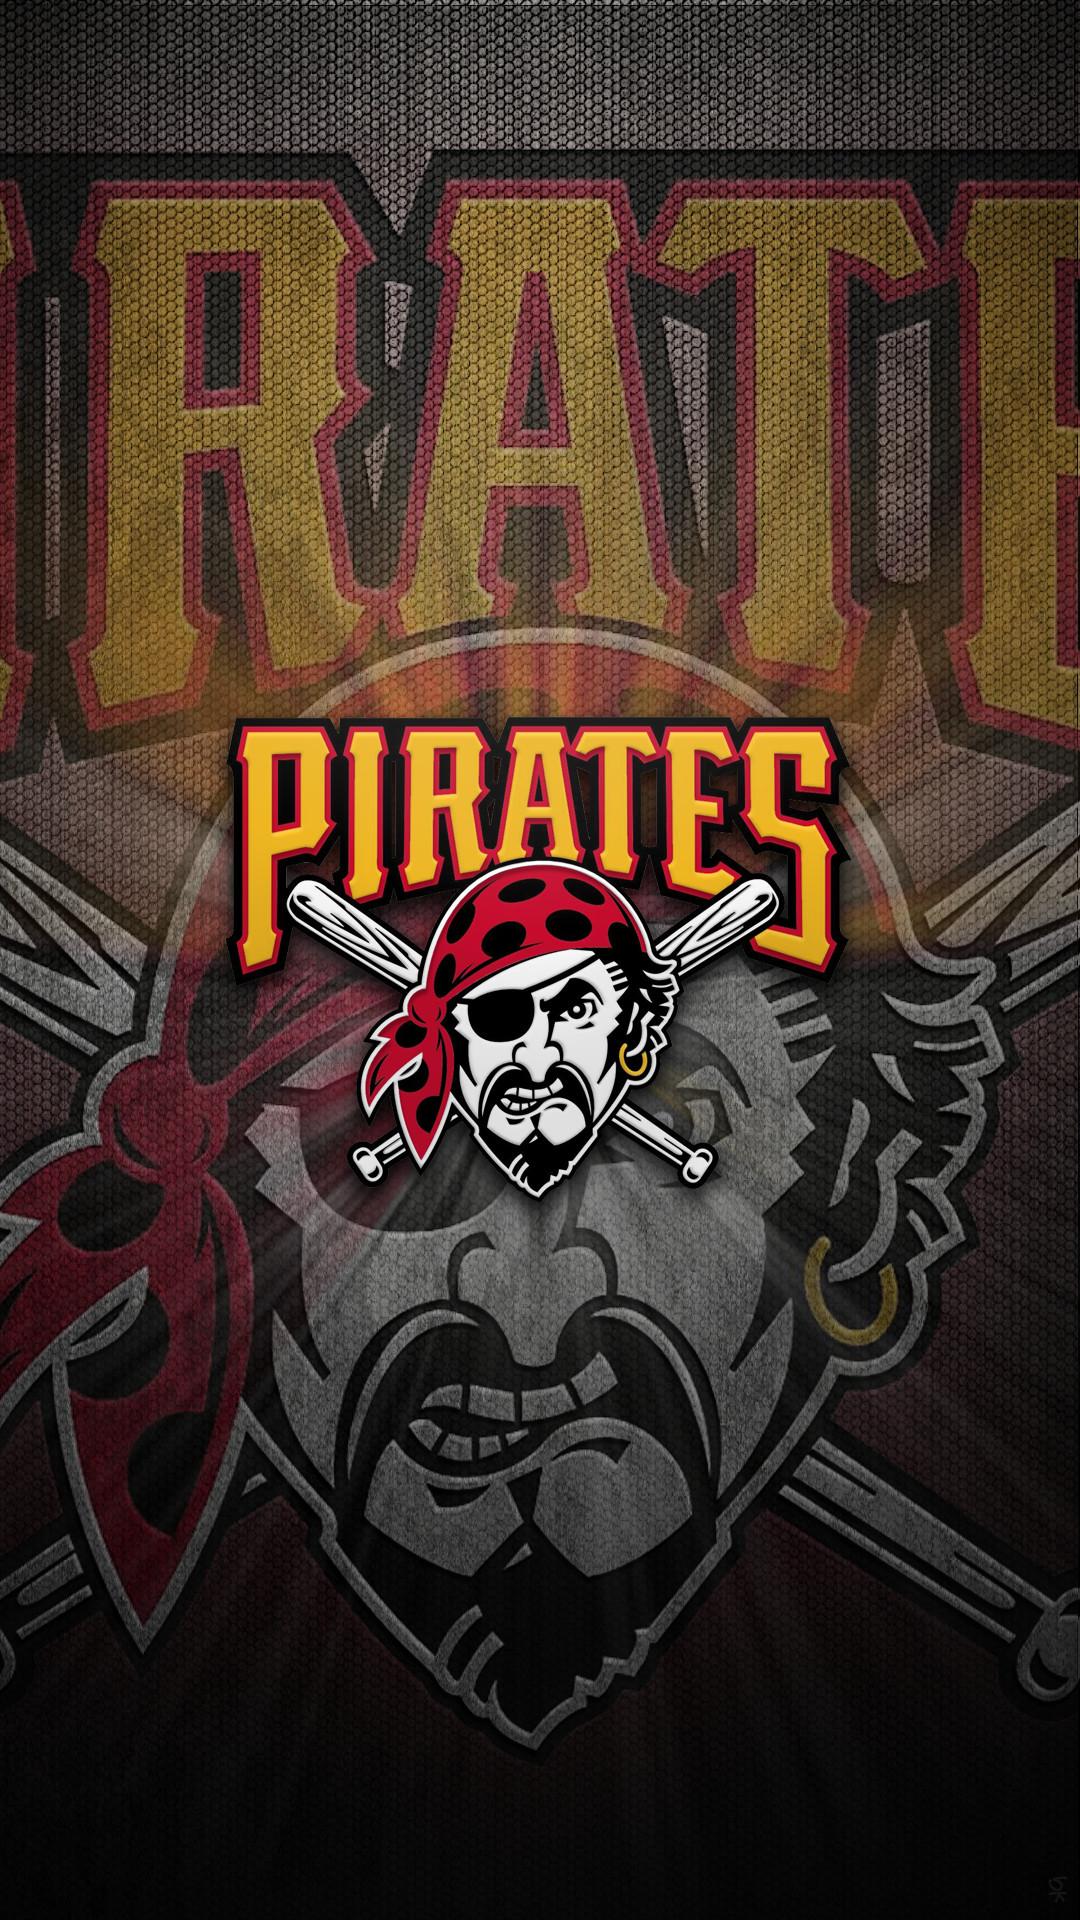 Pittsburgh Pirates 03.png